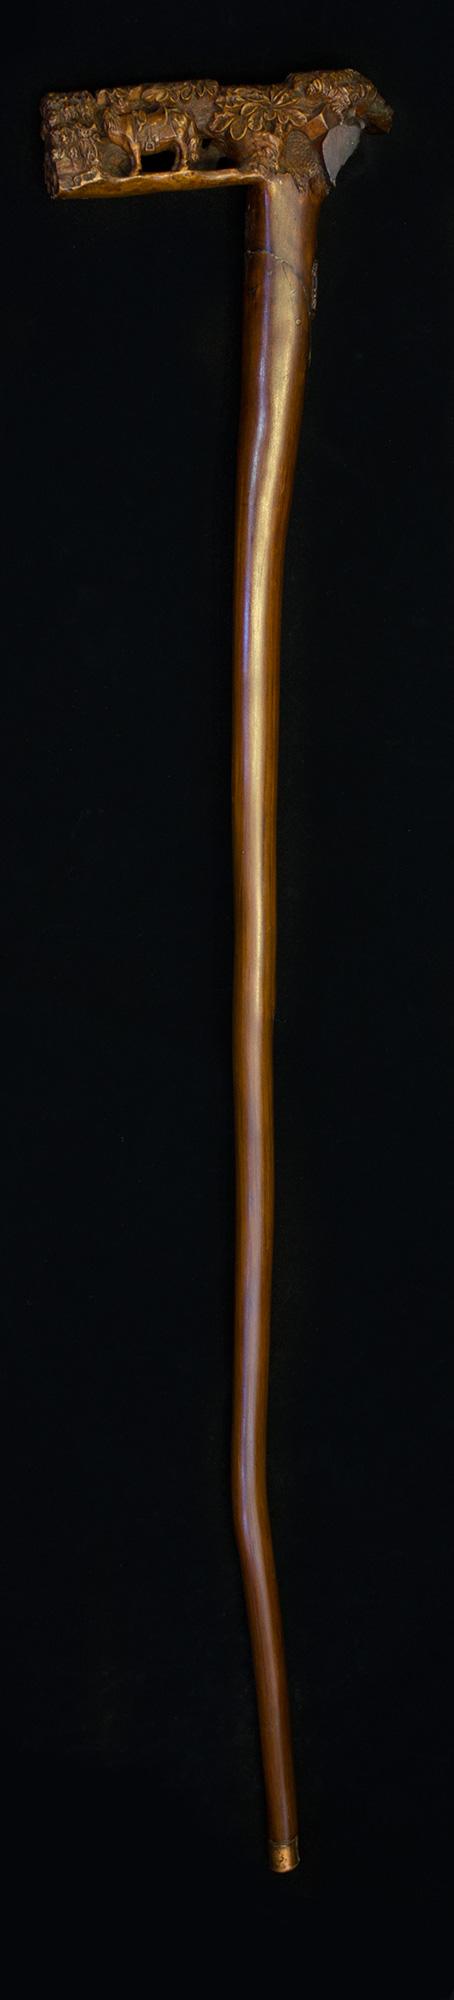 69- Bengala portuguesa 1